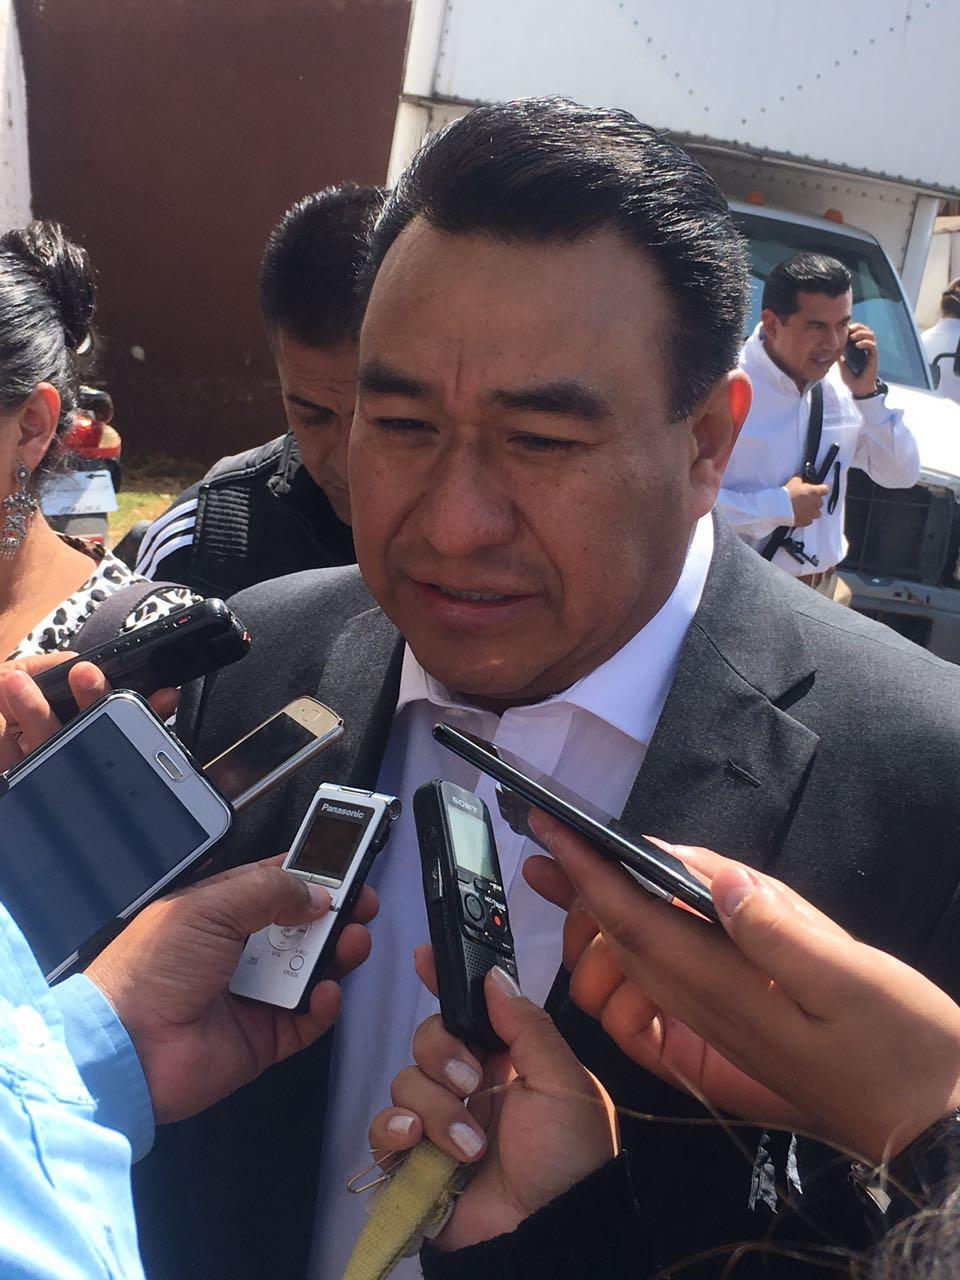 Niñera golpeadora se encuentra prófuga de la justicia: Pérez Carro